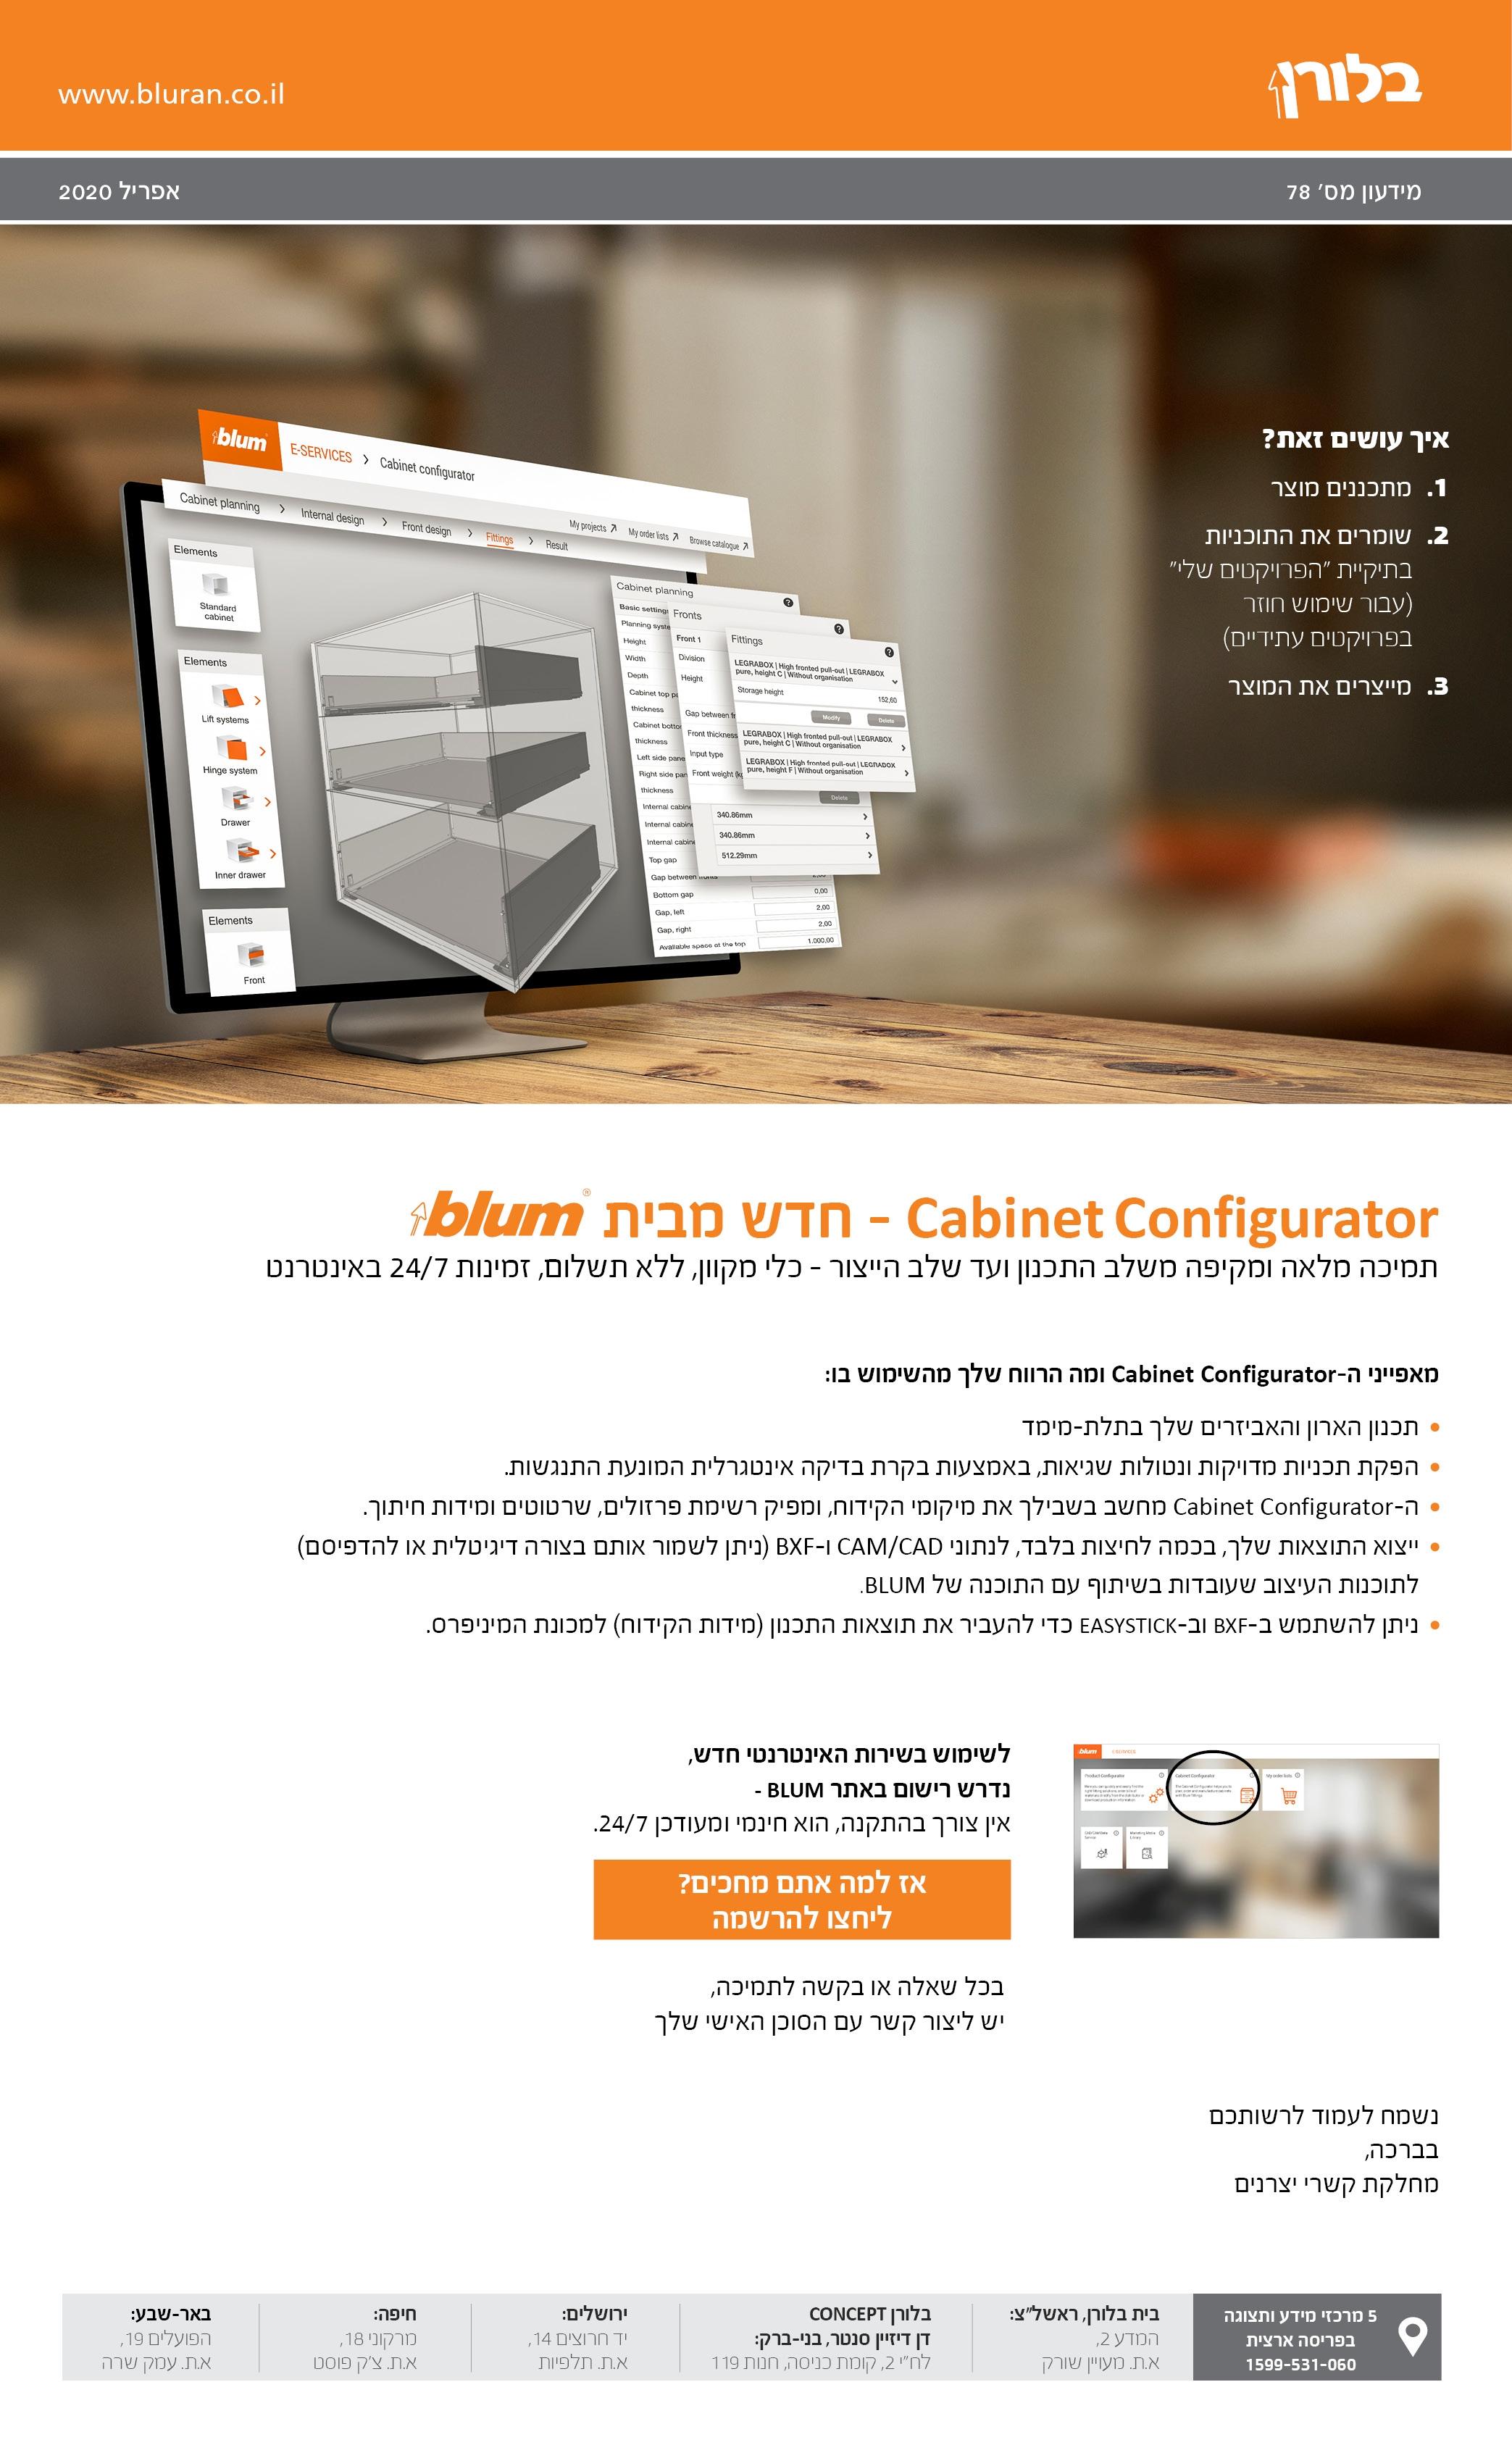 Cabinet Configurator תכנון ארונות יעיל, מהיר וידידותי